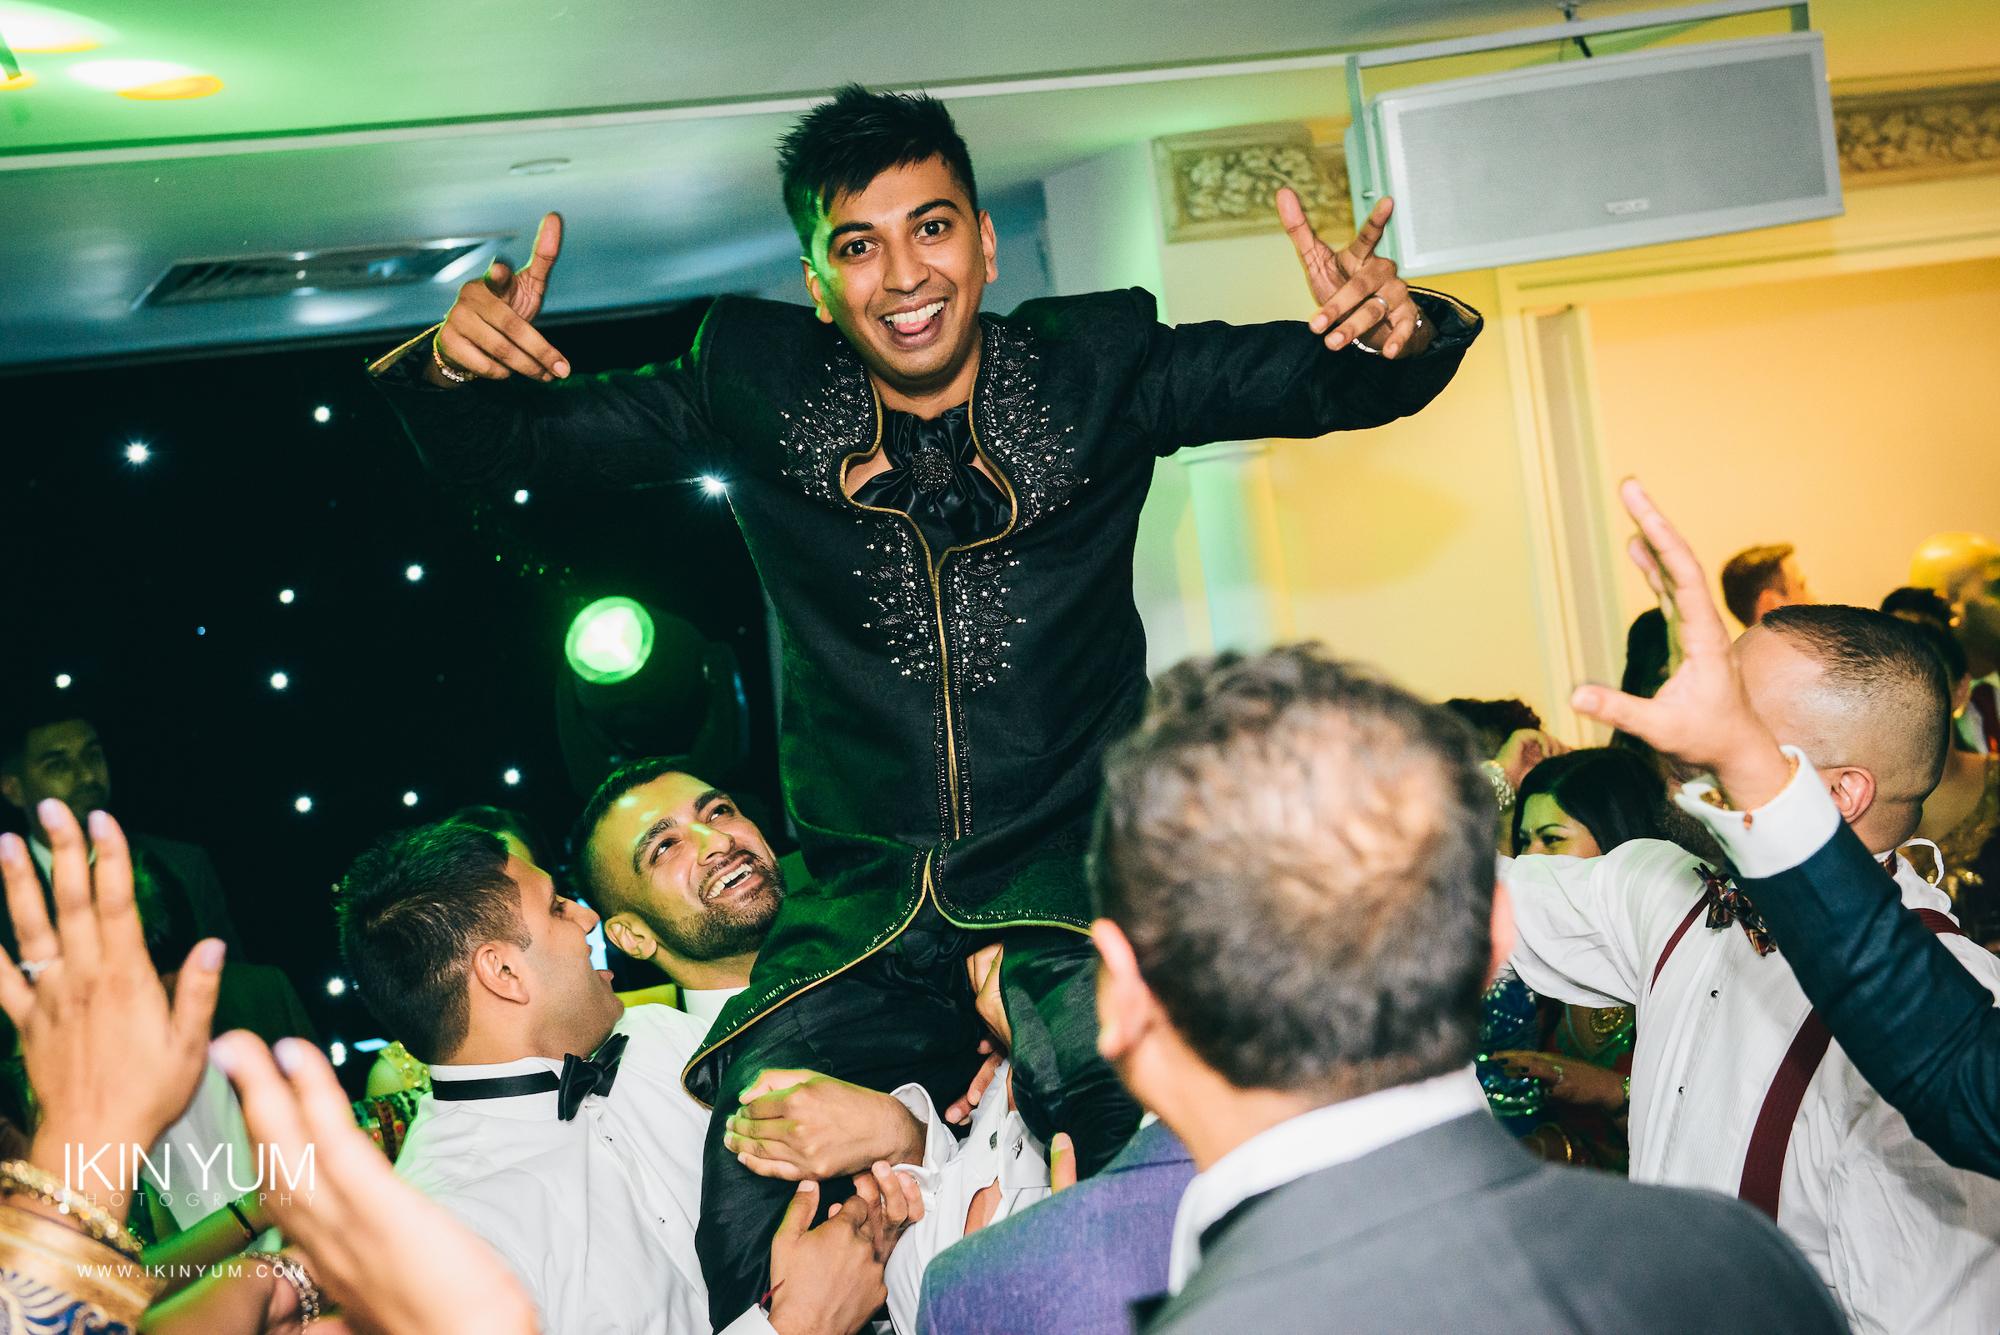 Froyle Park Indian Wedding - Ikin Yum Photography-157.jpg